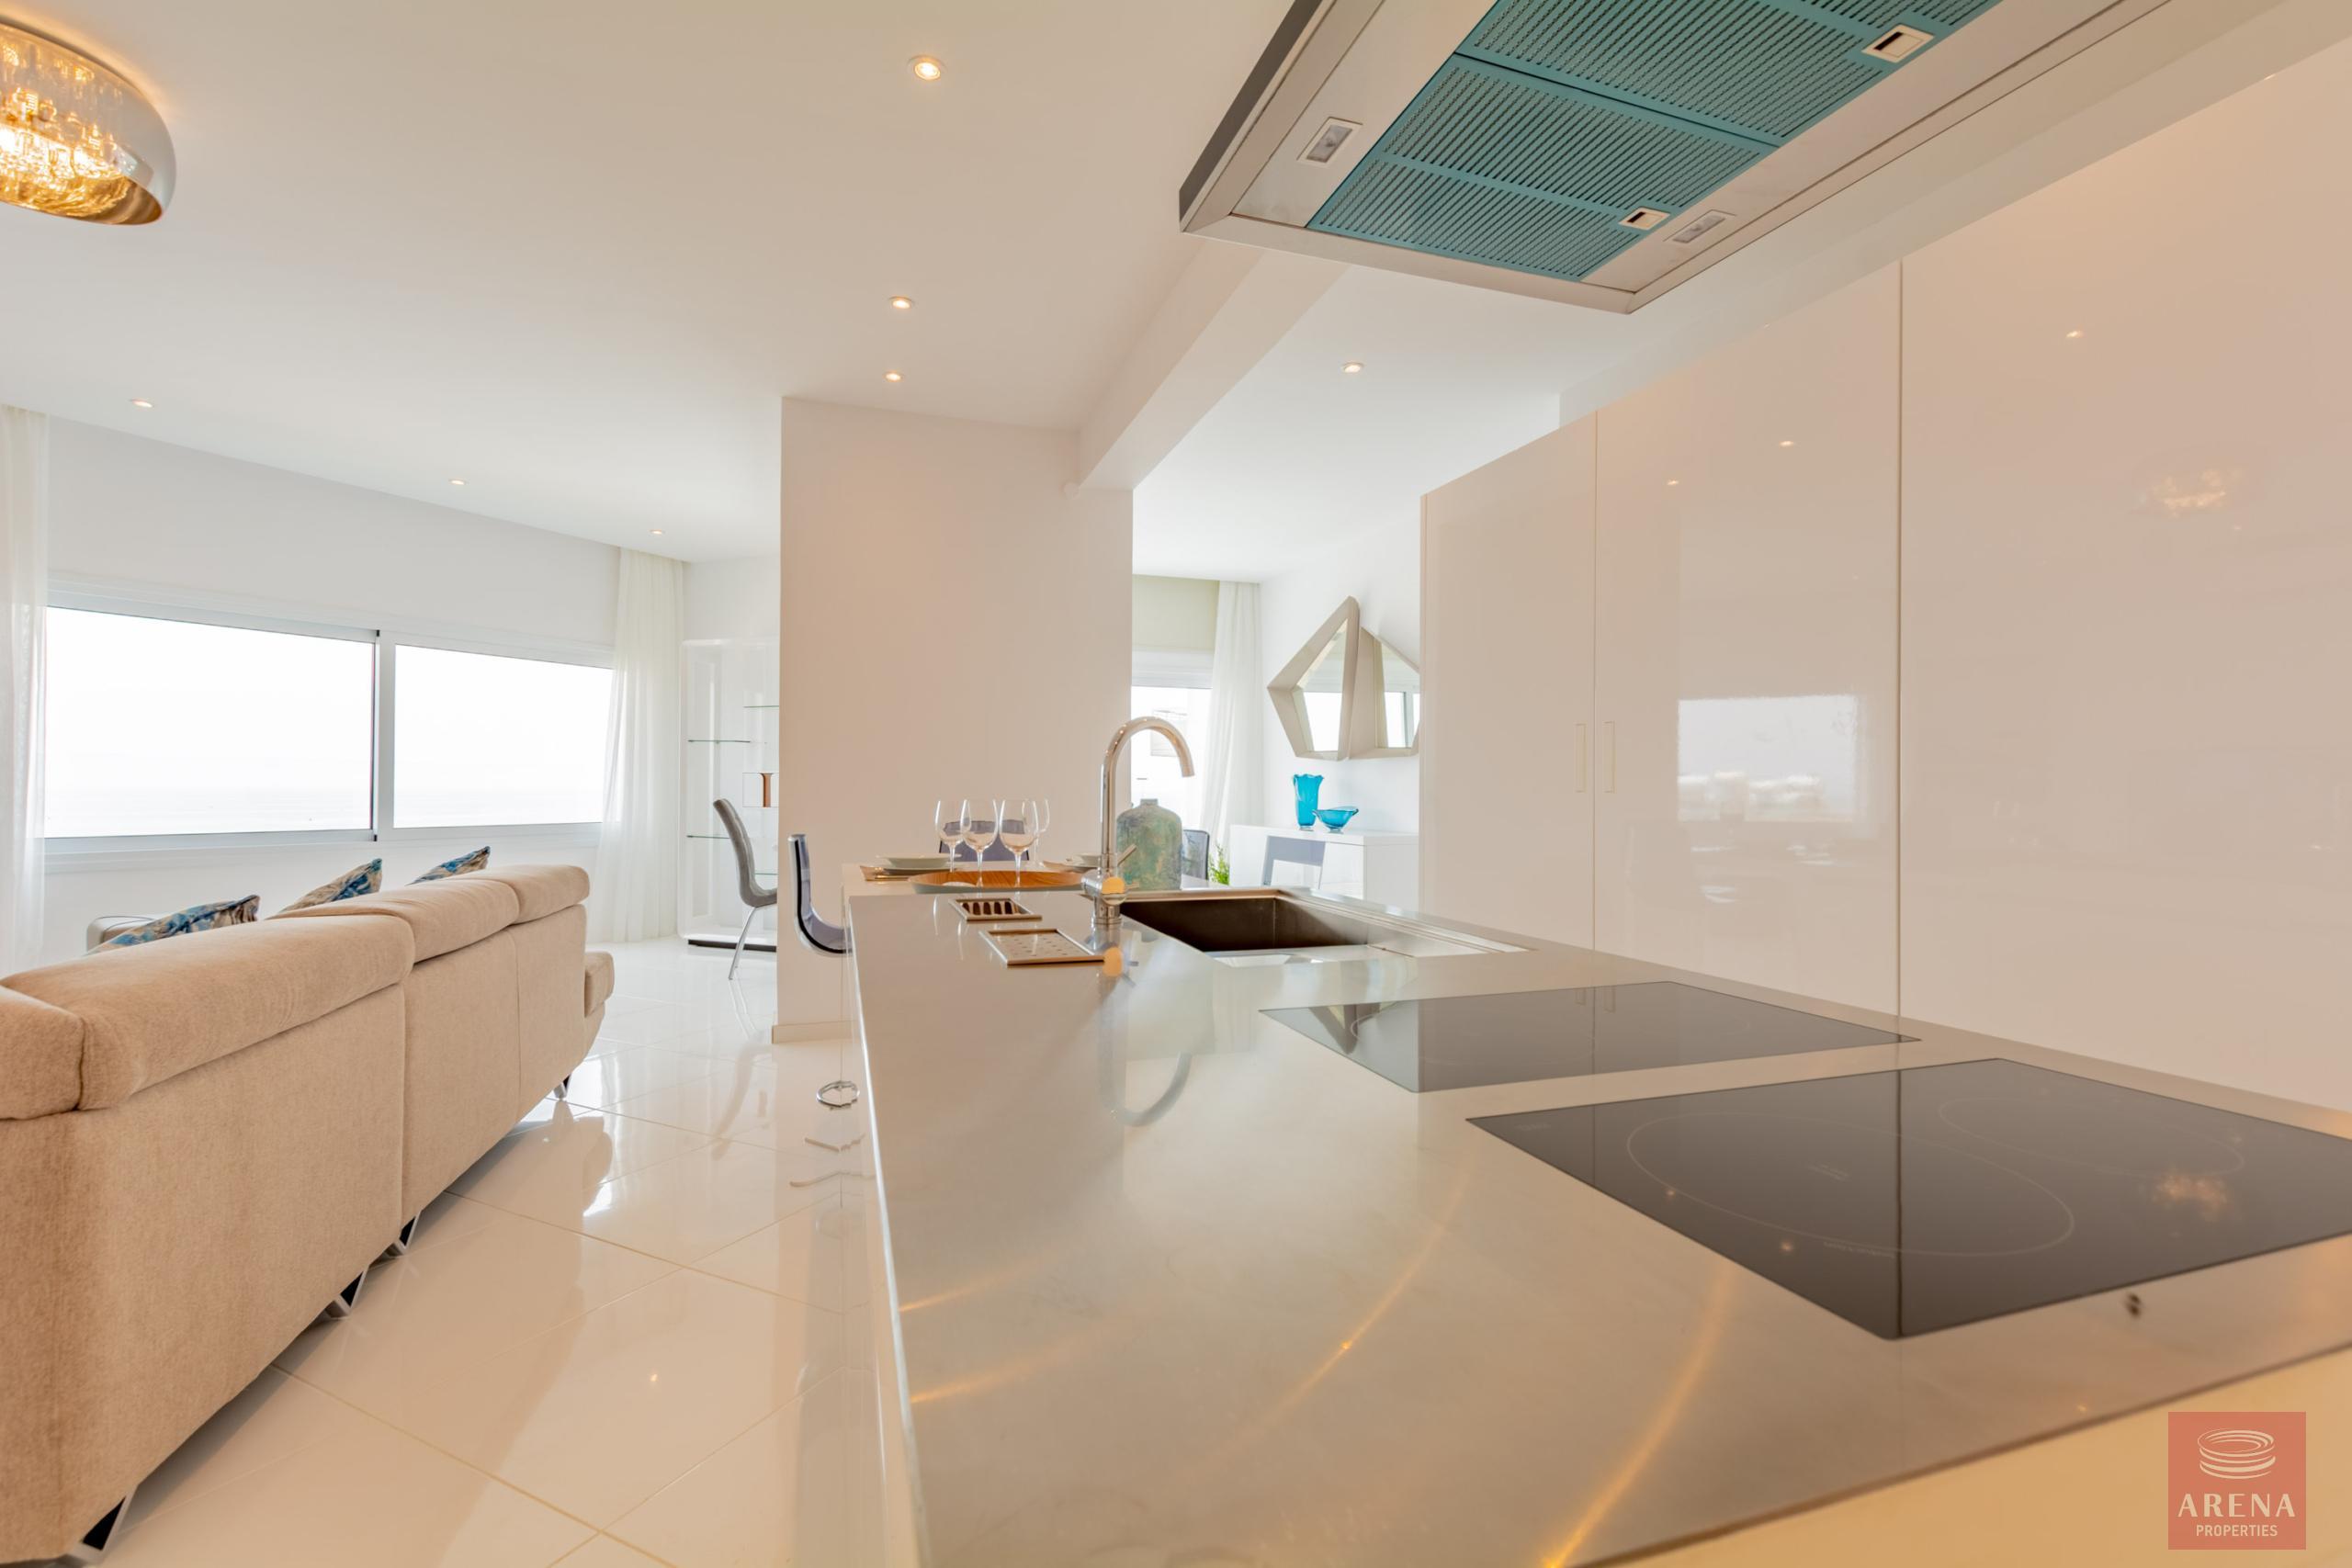 Apartment in Ayia Triada - kitchen